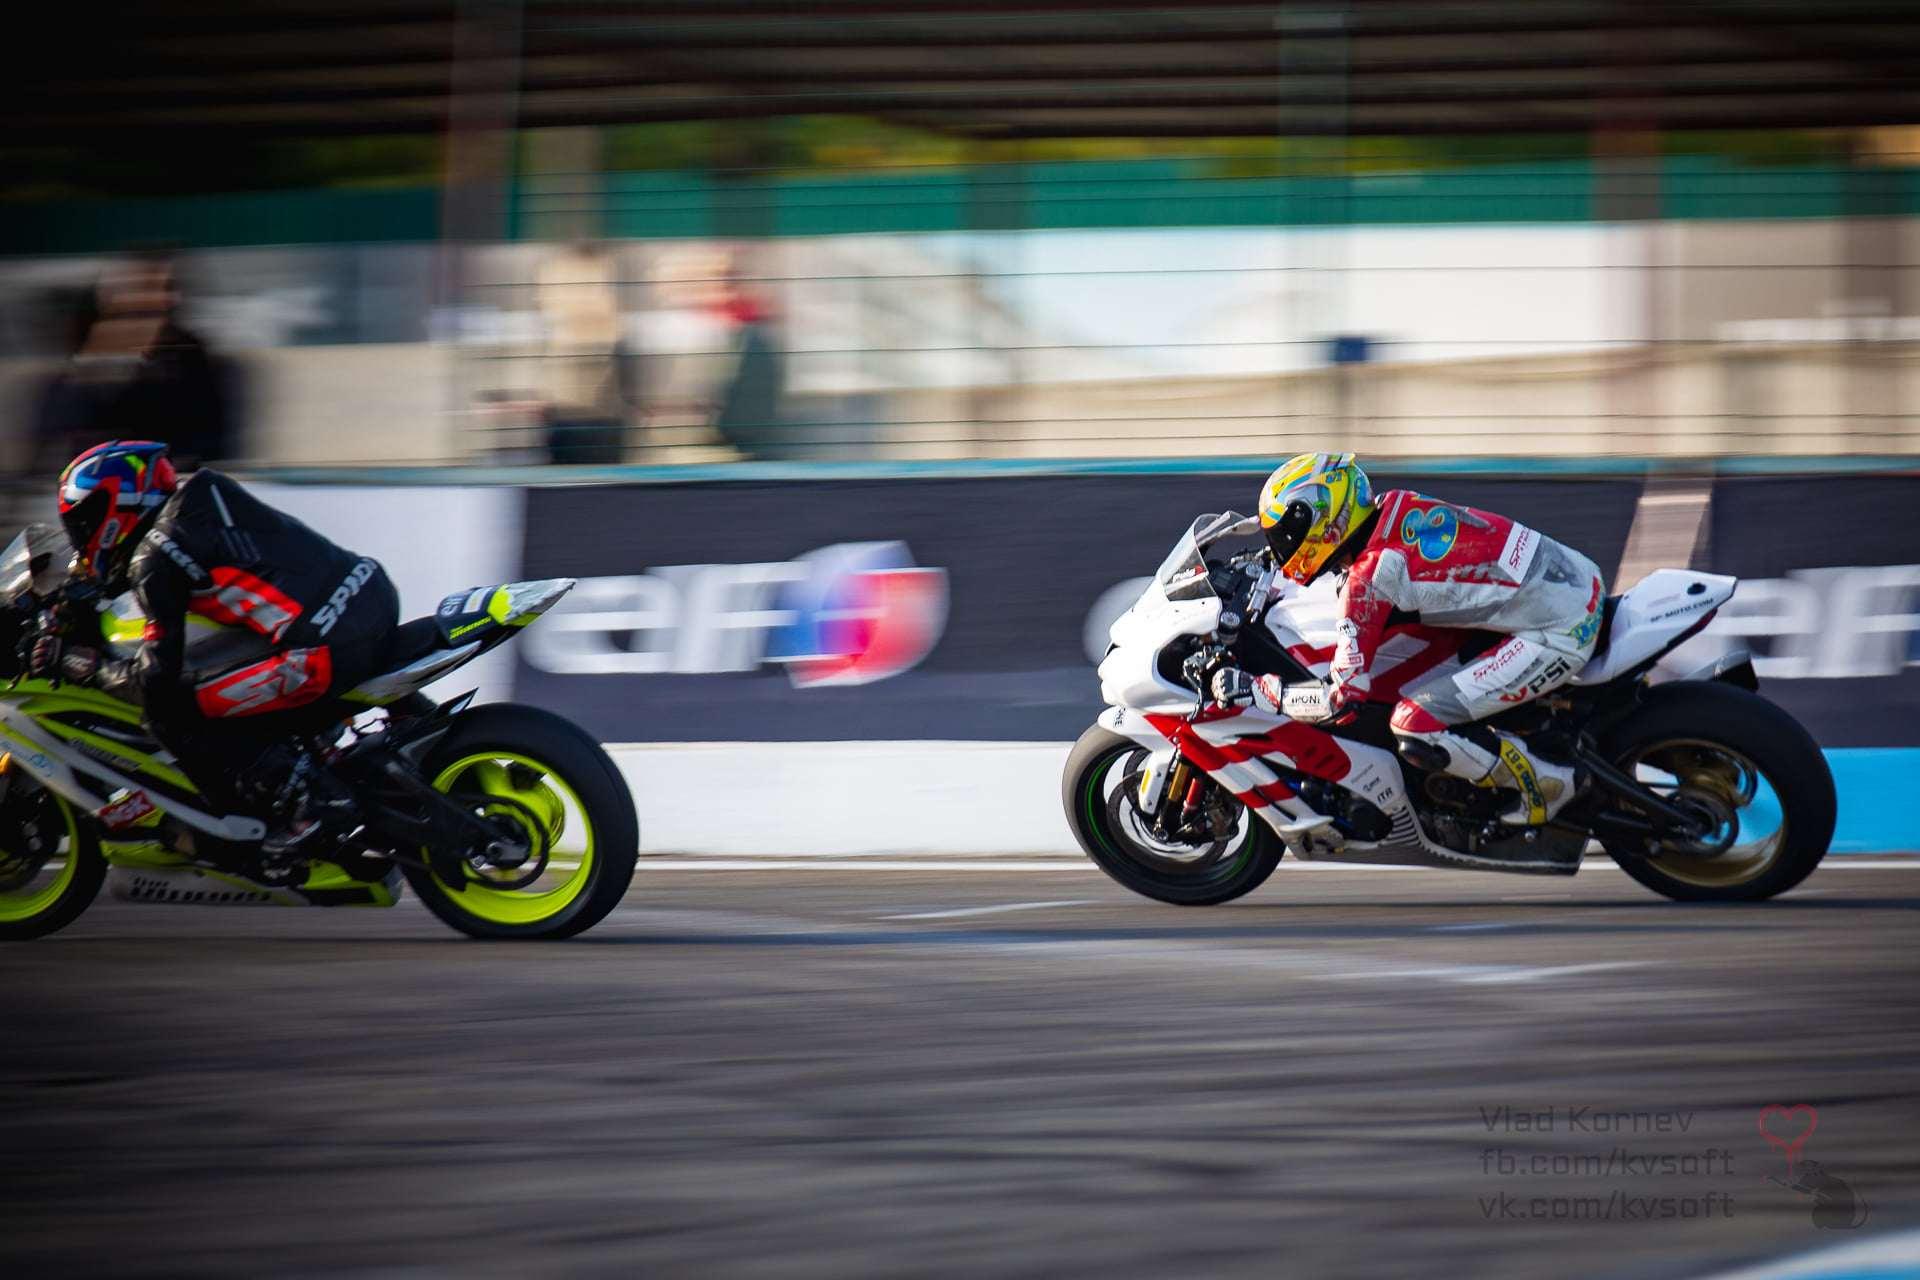 5-6_etap_MotoGPUkraine_133